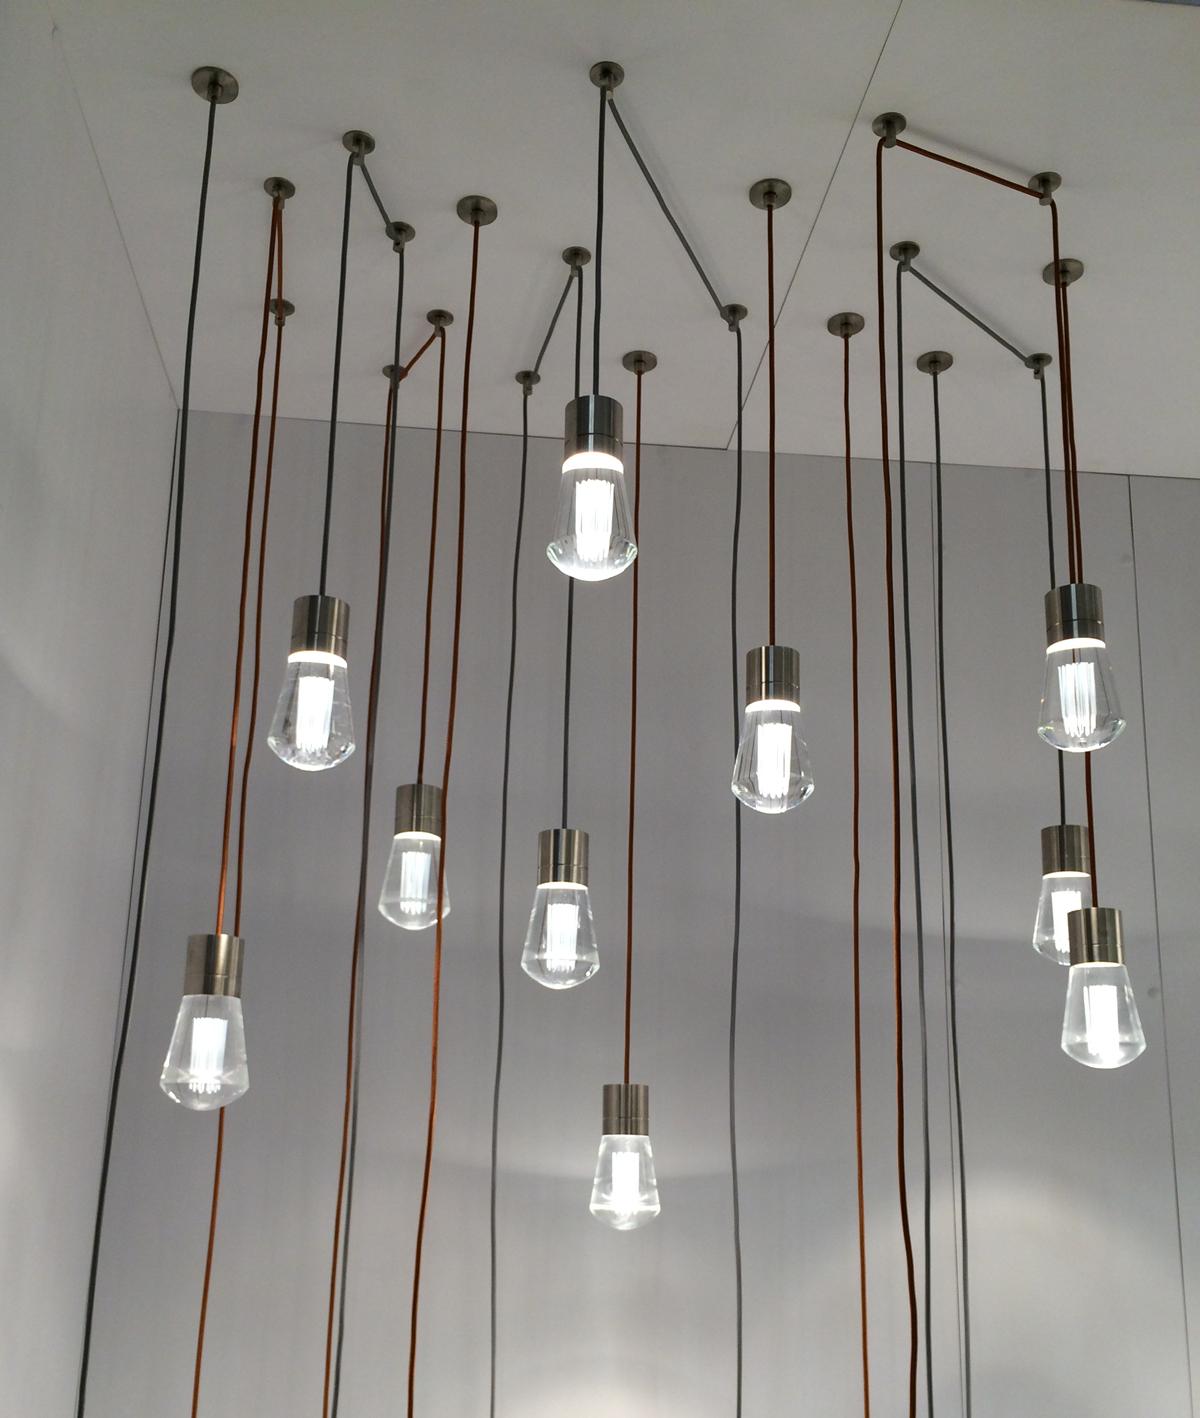 Tech lighting mina light my nest tech lighting alva led pendant wins design award mozeypictures Gallery